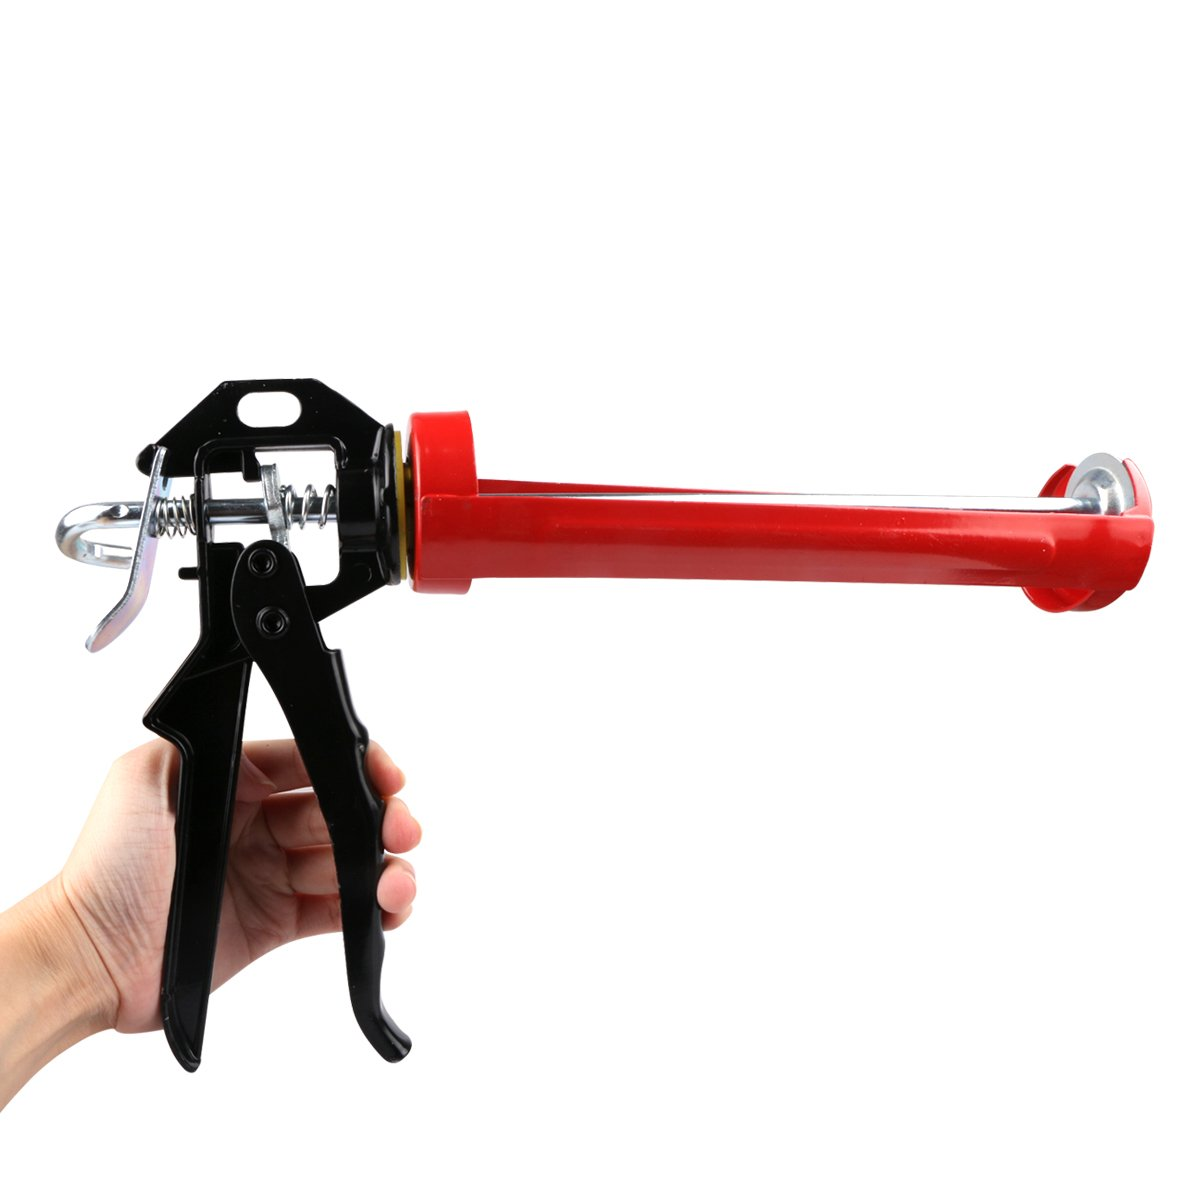 Benbo Heavy Duty Caulking Gun,1/10-Gallon Cartridge Capacity,18:1 Thrust Ratio by Benbo